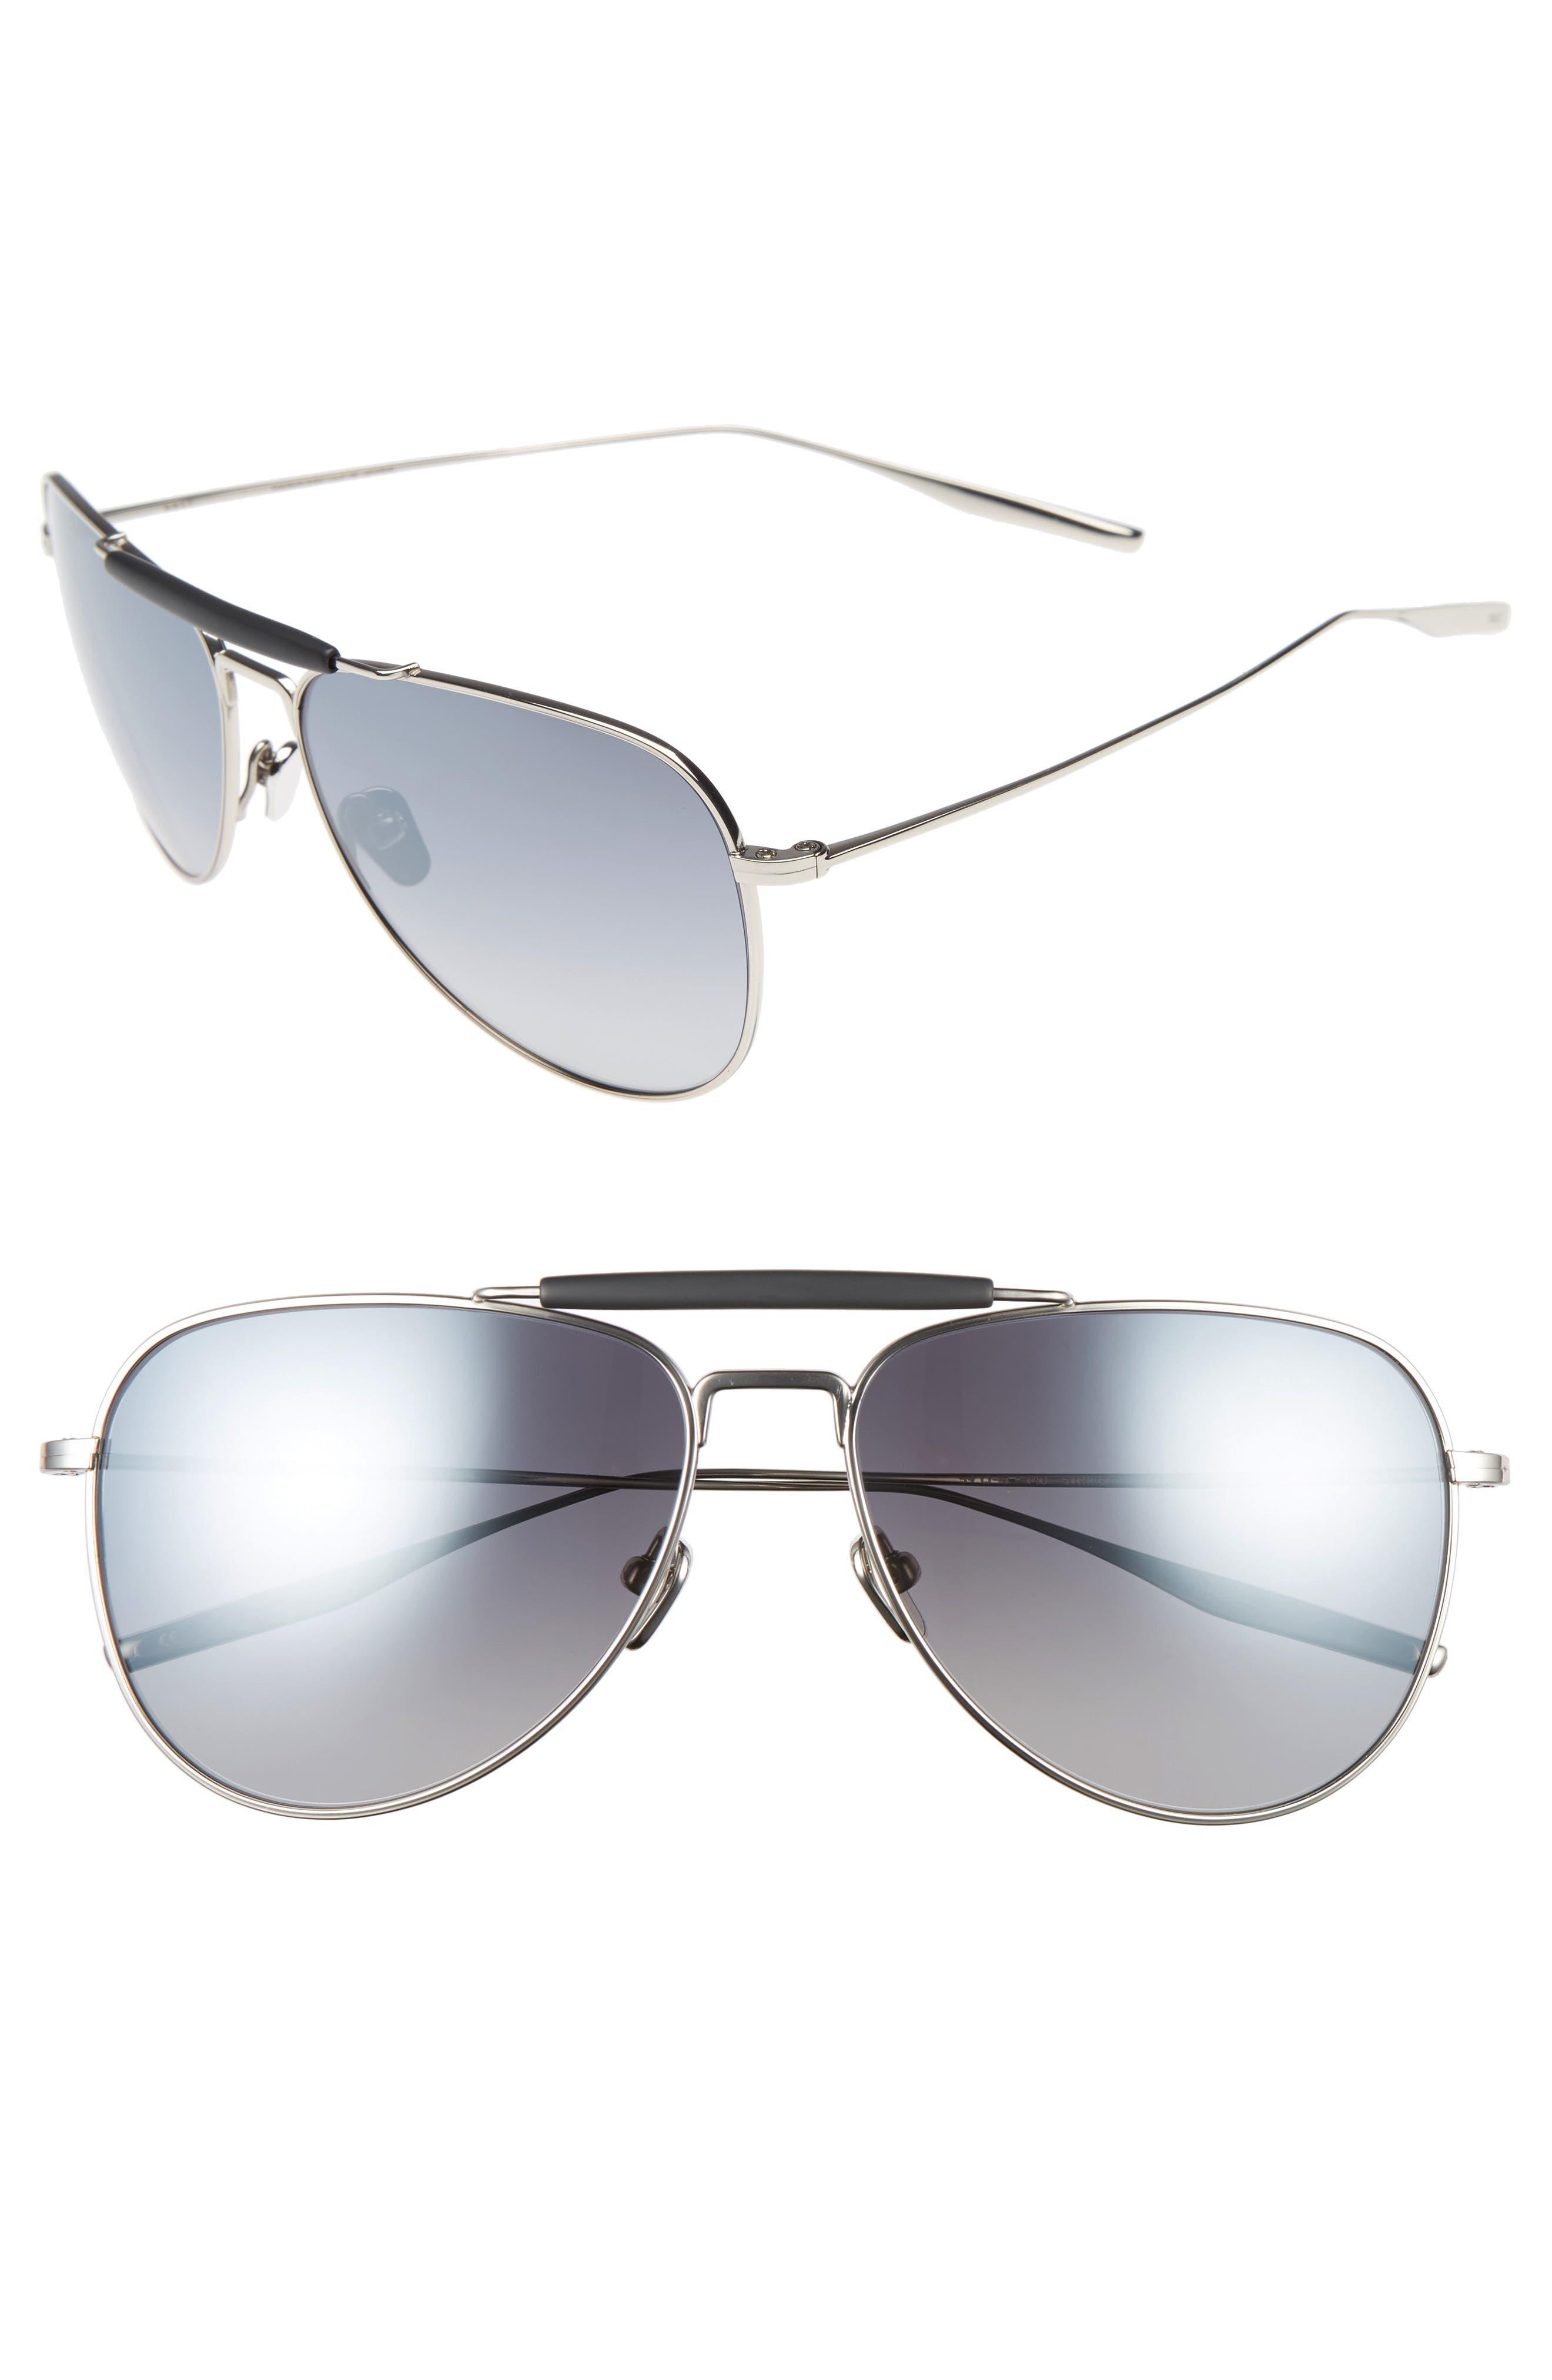 Striker 59mm Aviator Sunglasses,                             Alternate thumbnail 3, color,                             TRADITIONAL SILVER